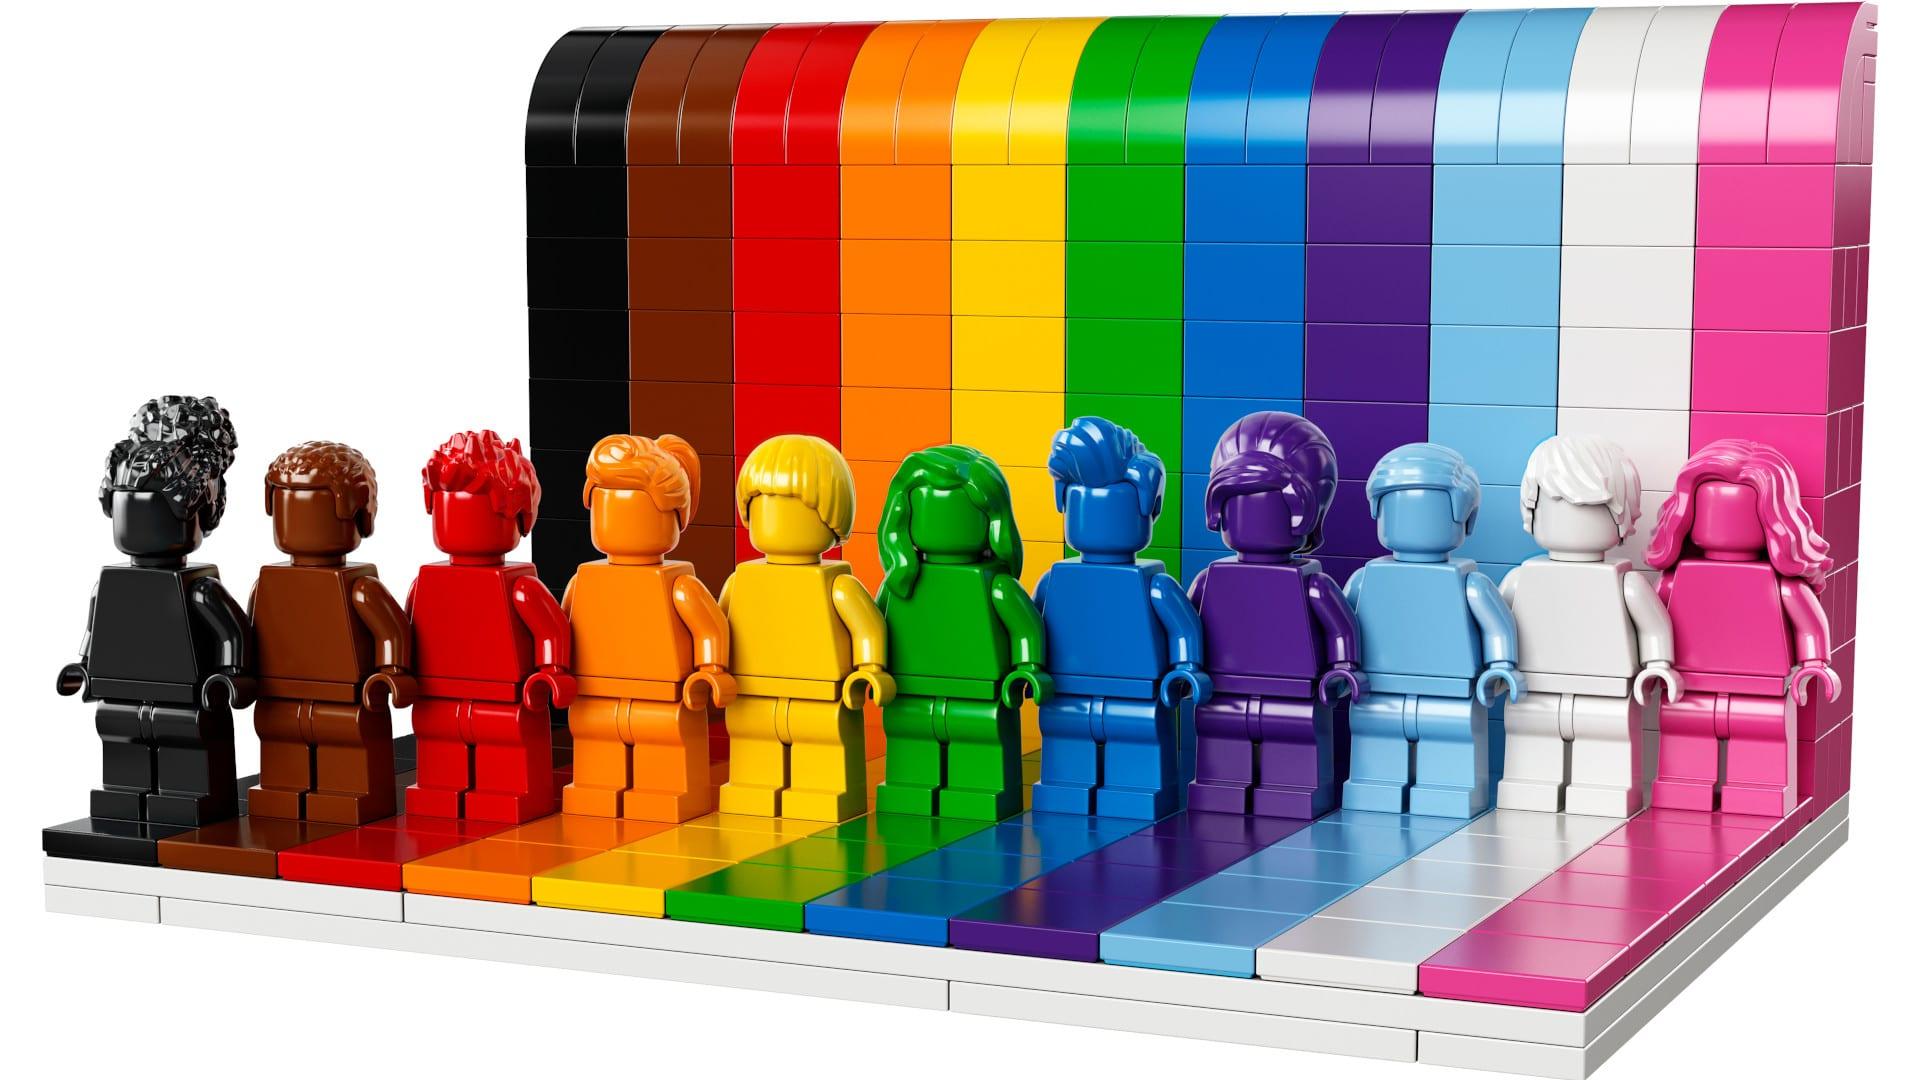 LEGO Jeder ist besonders